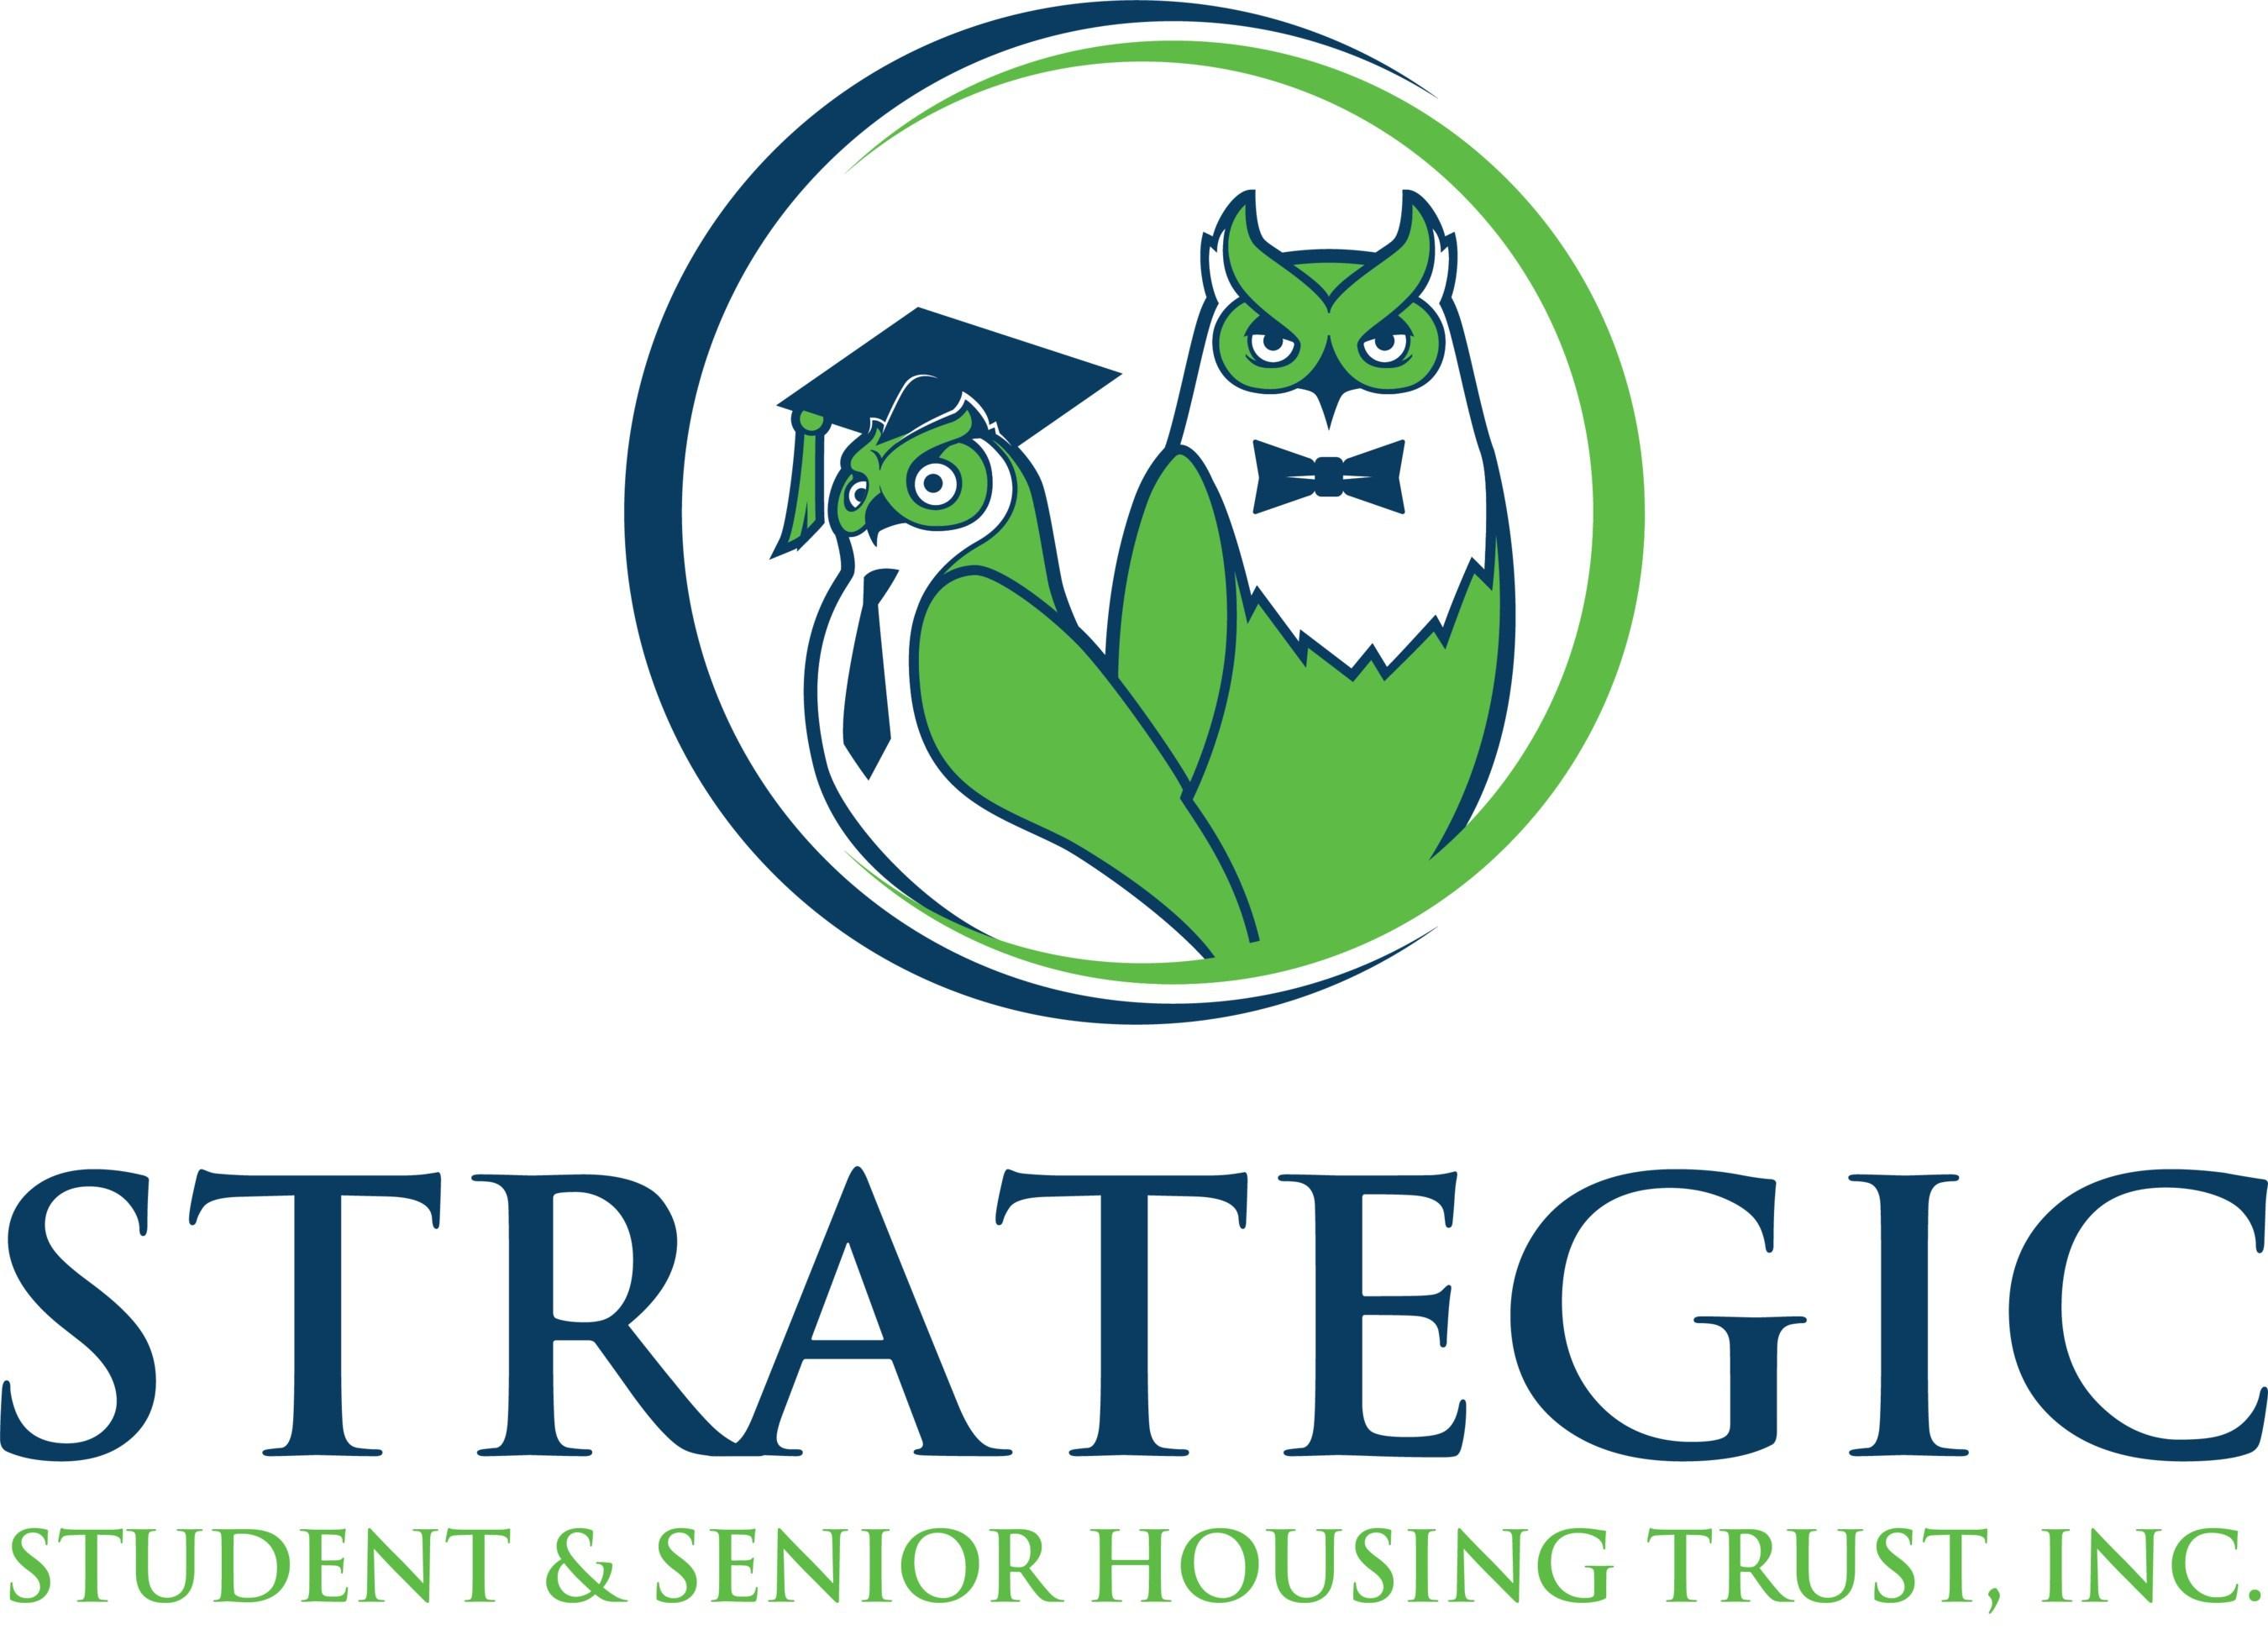 Strategic Student & Senior Housing Trust, Inc. (PRNewsfoto/Strategic Student & Senior Hous)